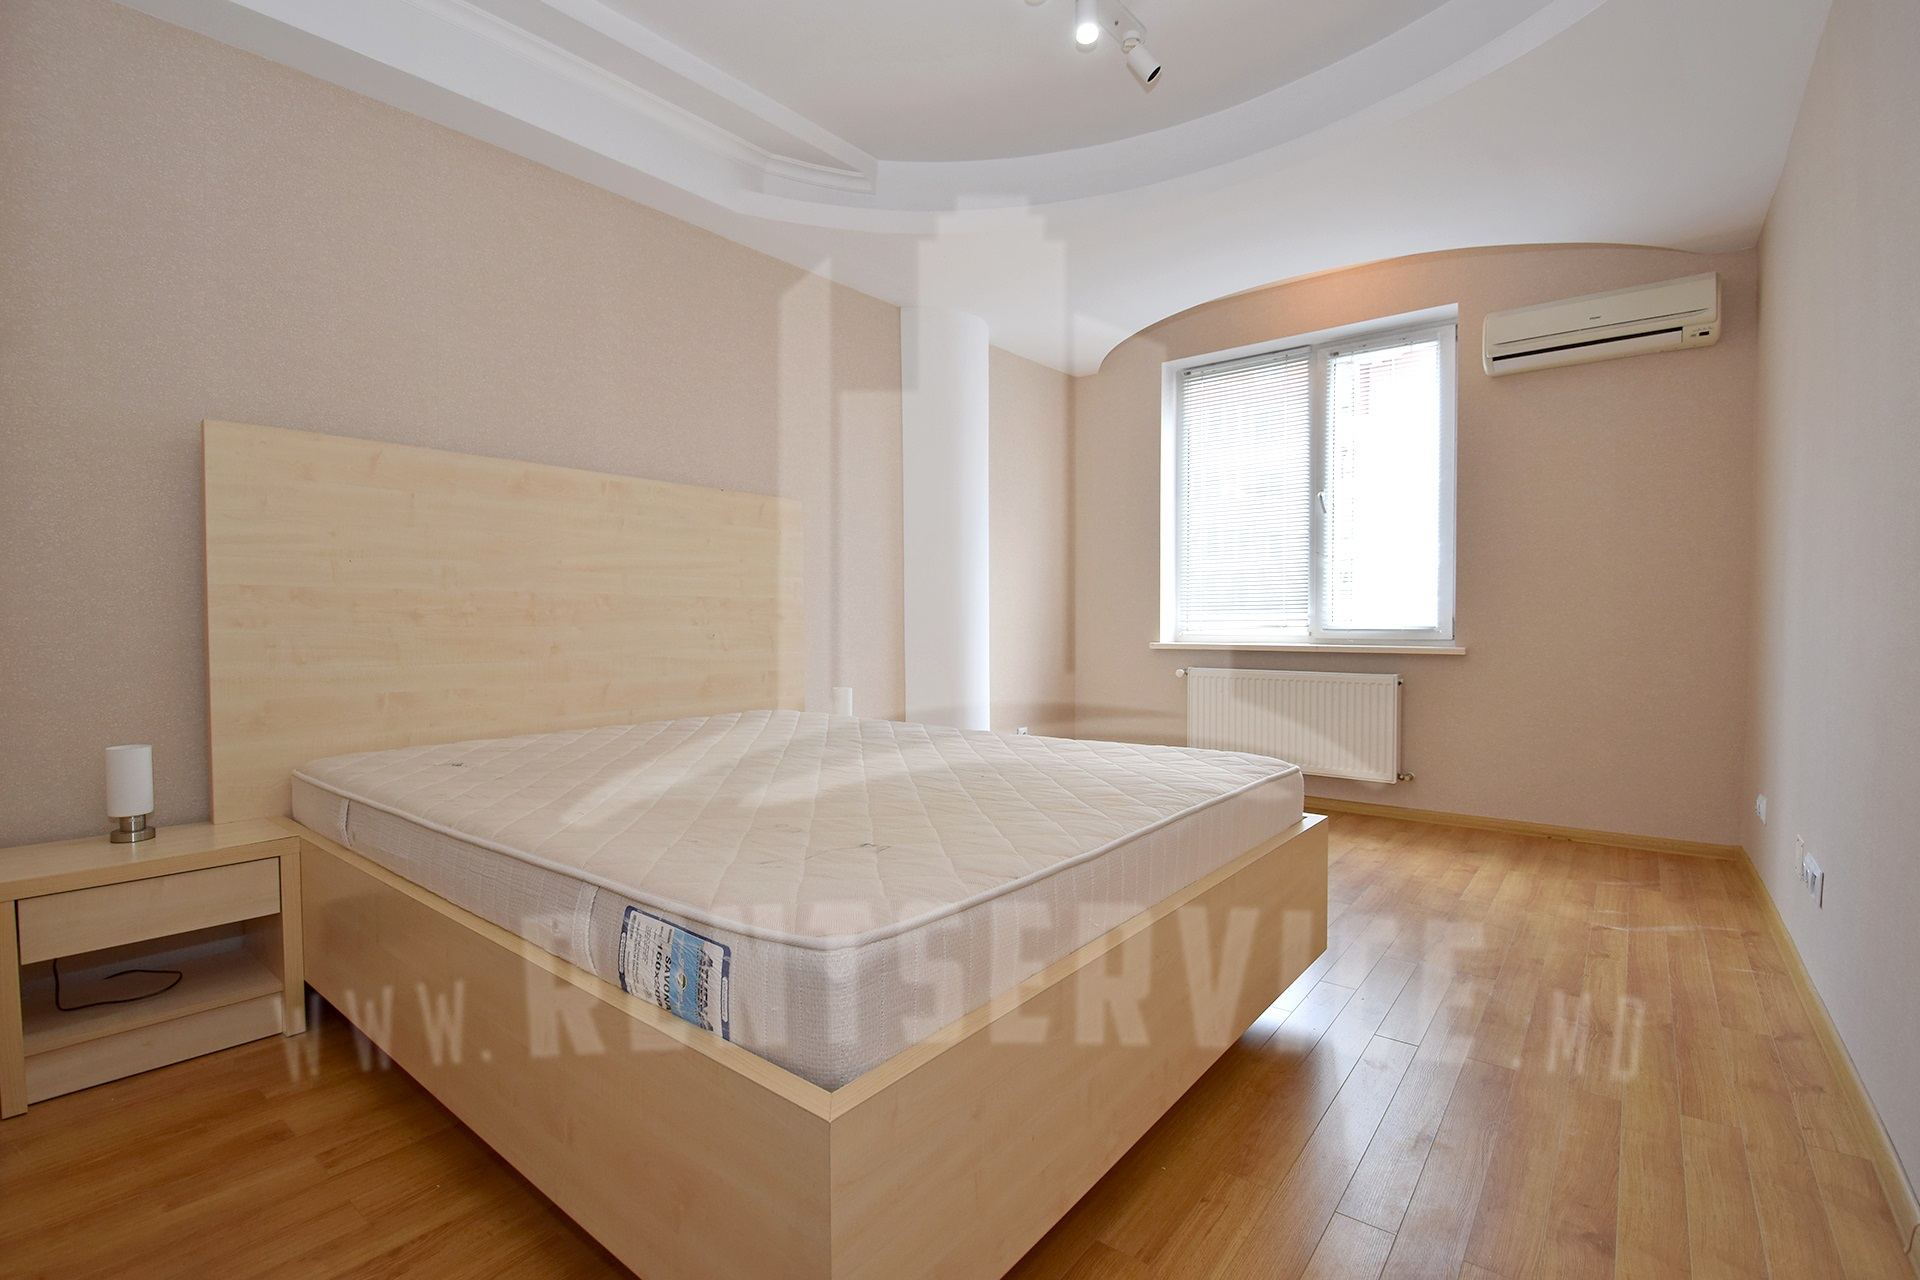 211_apartment_10.JPG